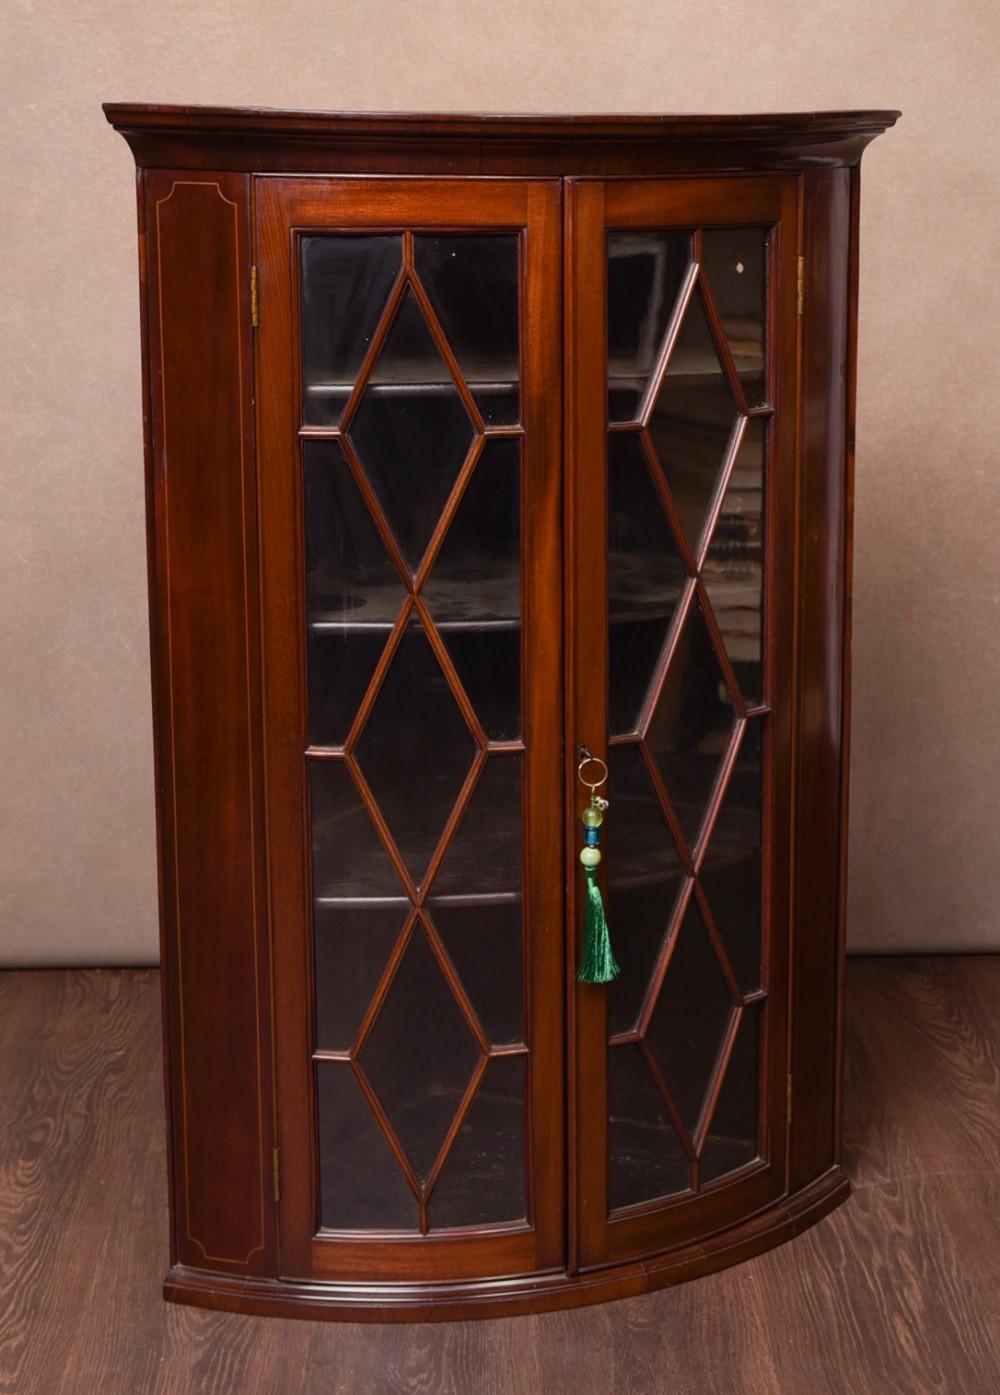 19th century inlaid mahogany bow fronted hanging corner cabinet